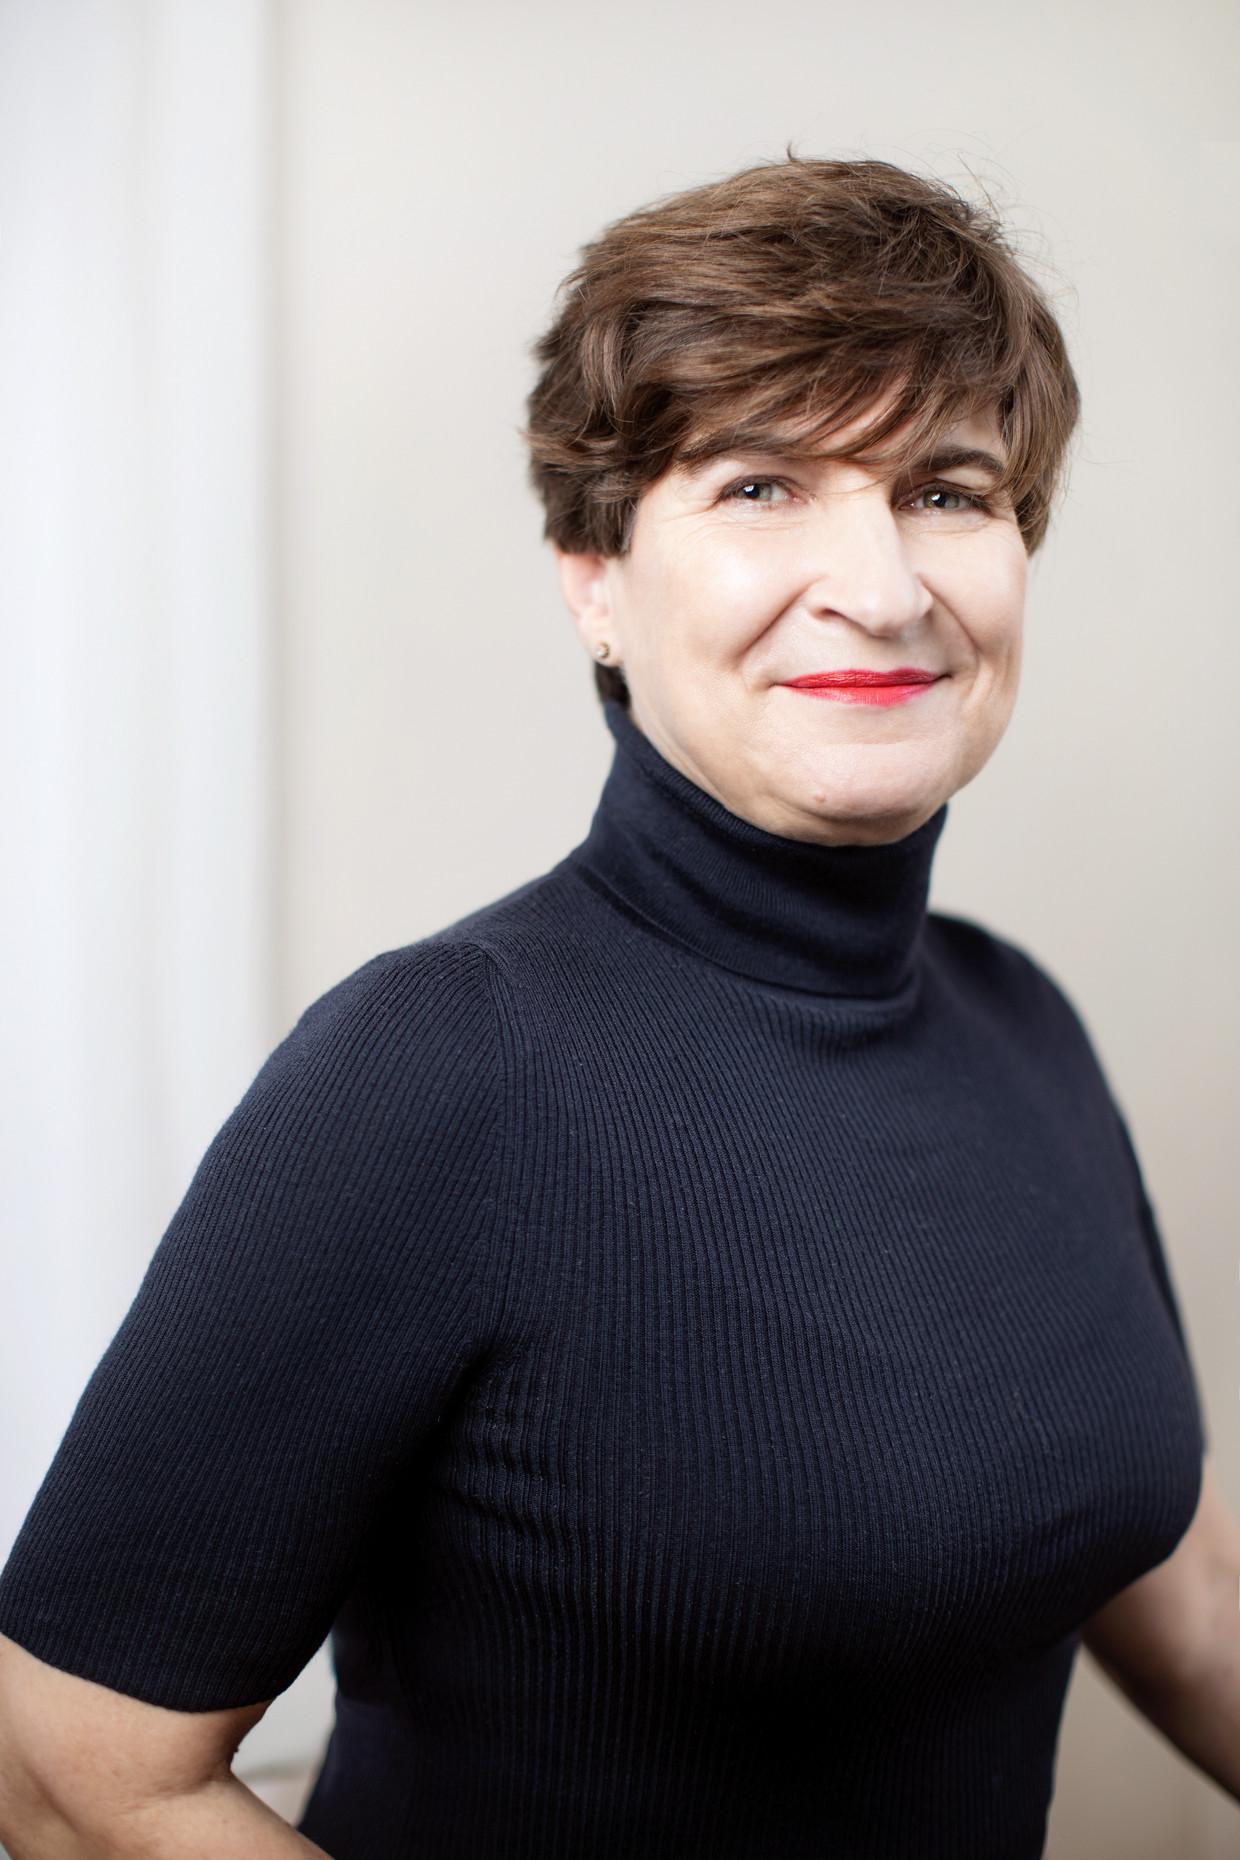 Lilianne Ploumen Beeld Malou van Breevoort